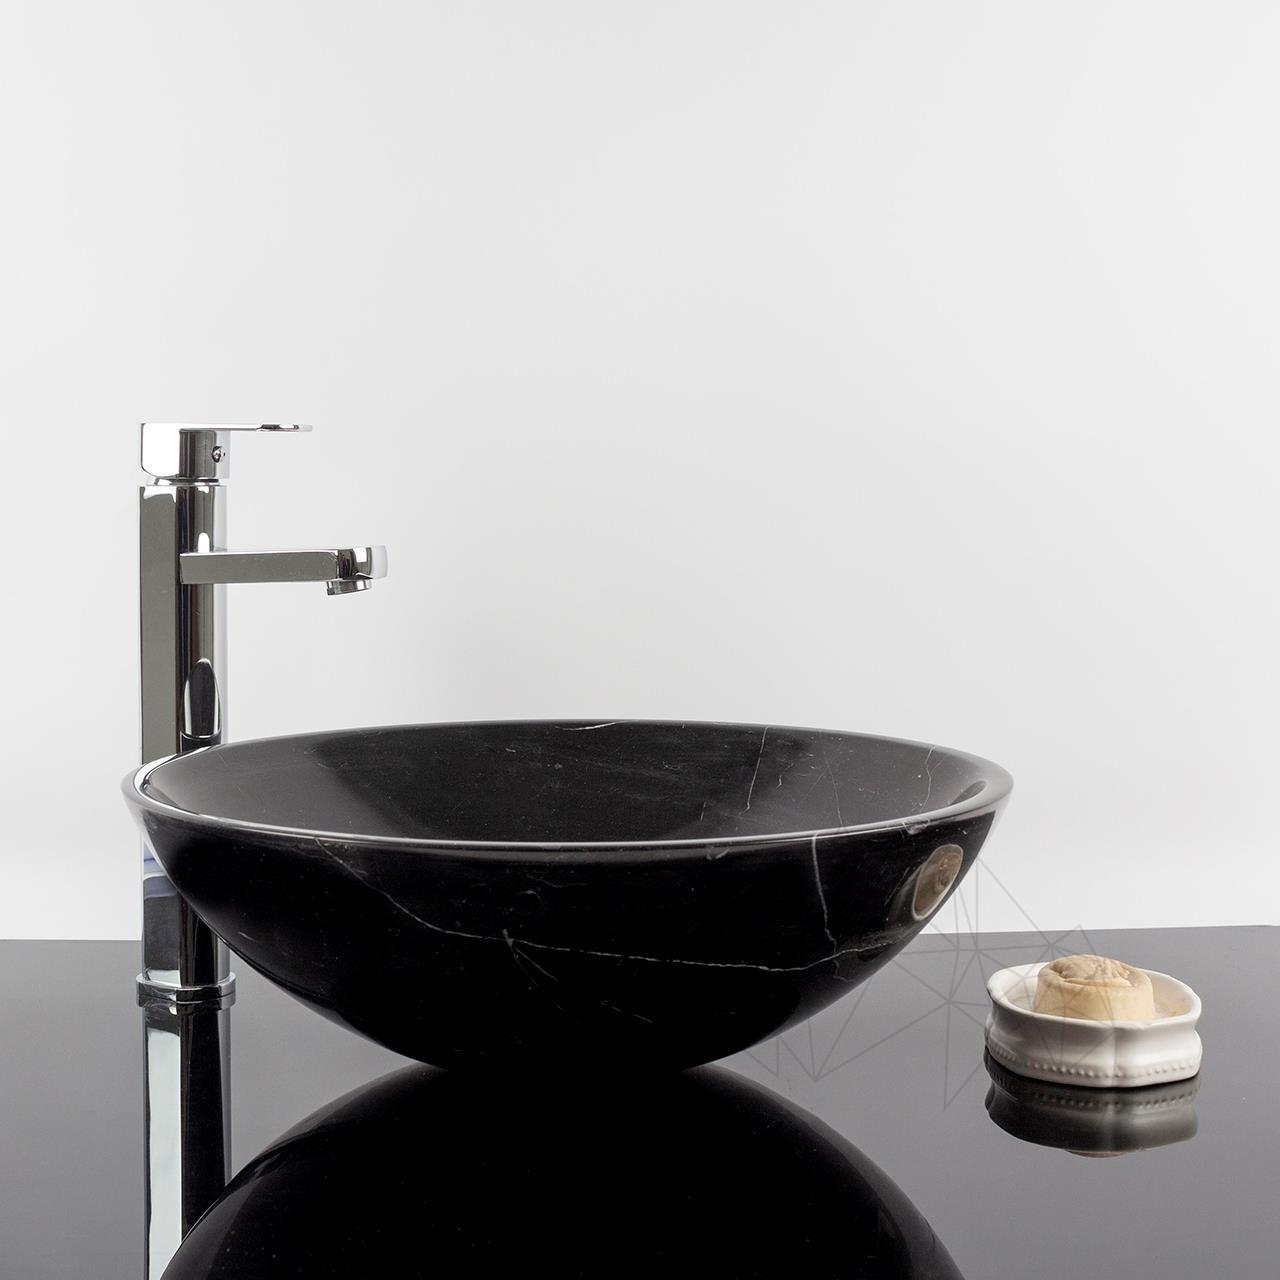 Bathroom Sink Nero Marquina Marble 42 X 14 Cm Piatraonline Com